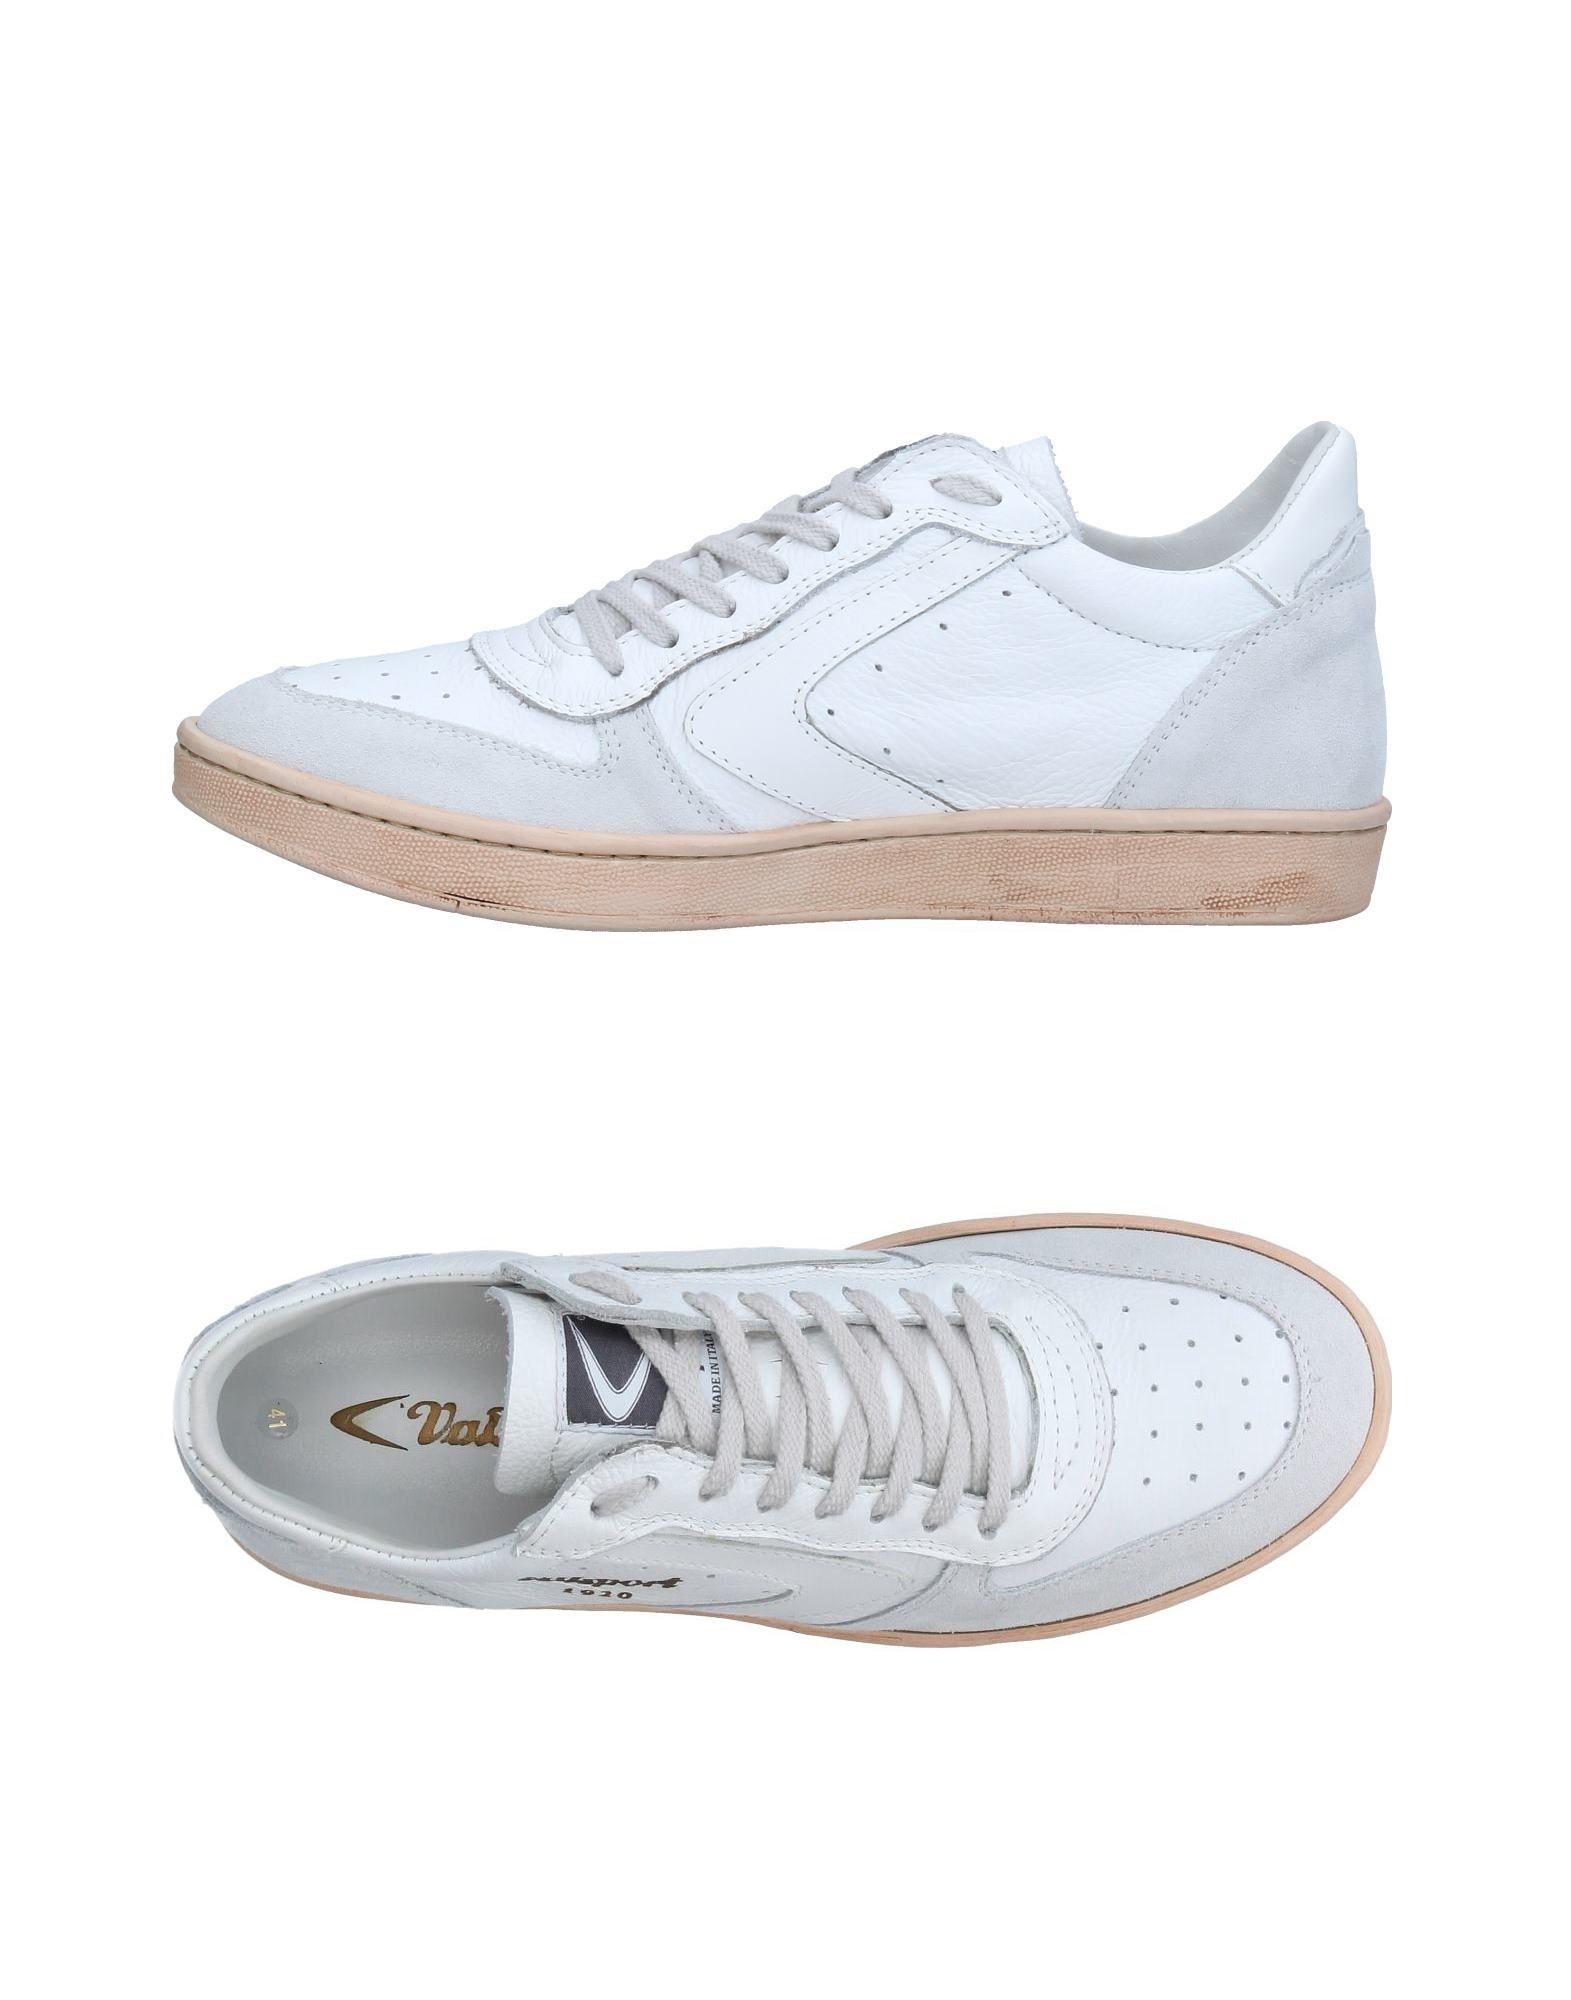 Valsport Sneakers Herren  11279281OQ Gute Qualität beliebte Schuhe